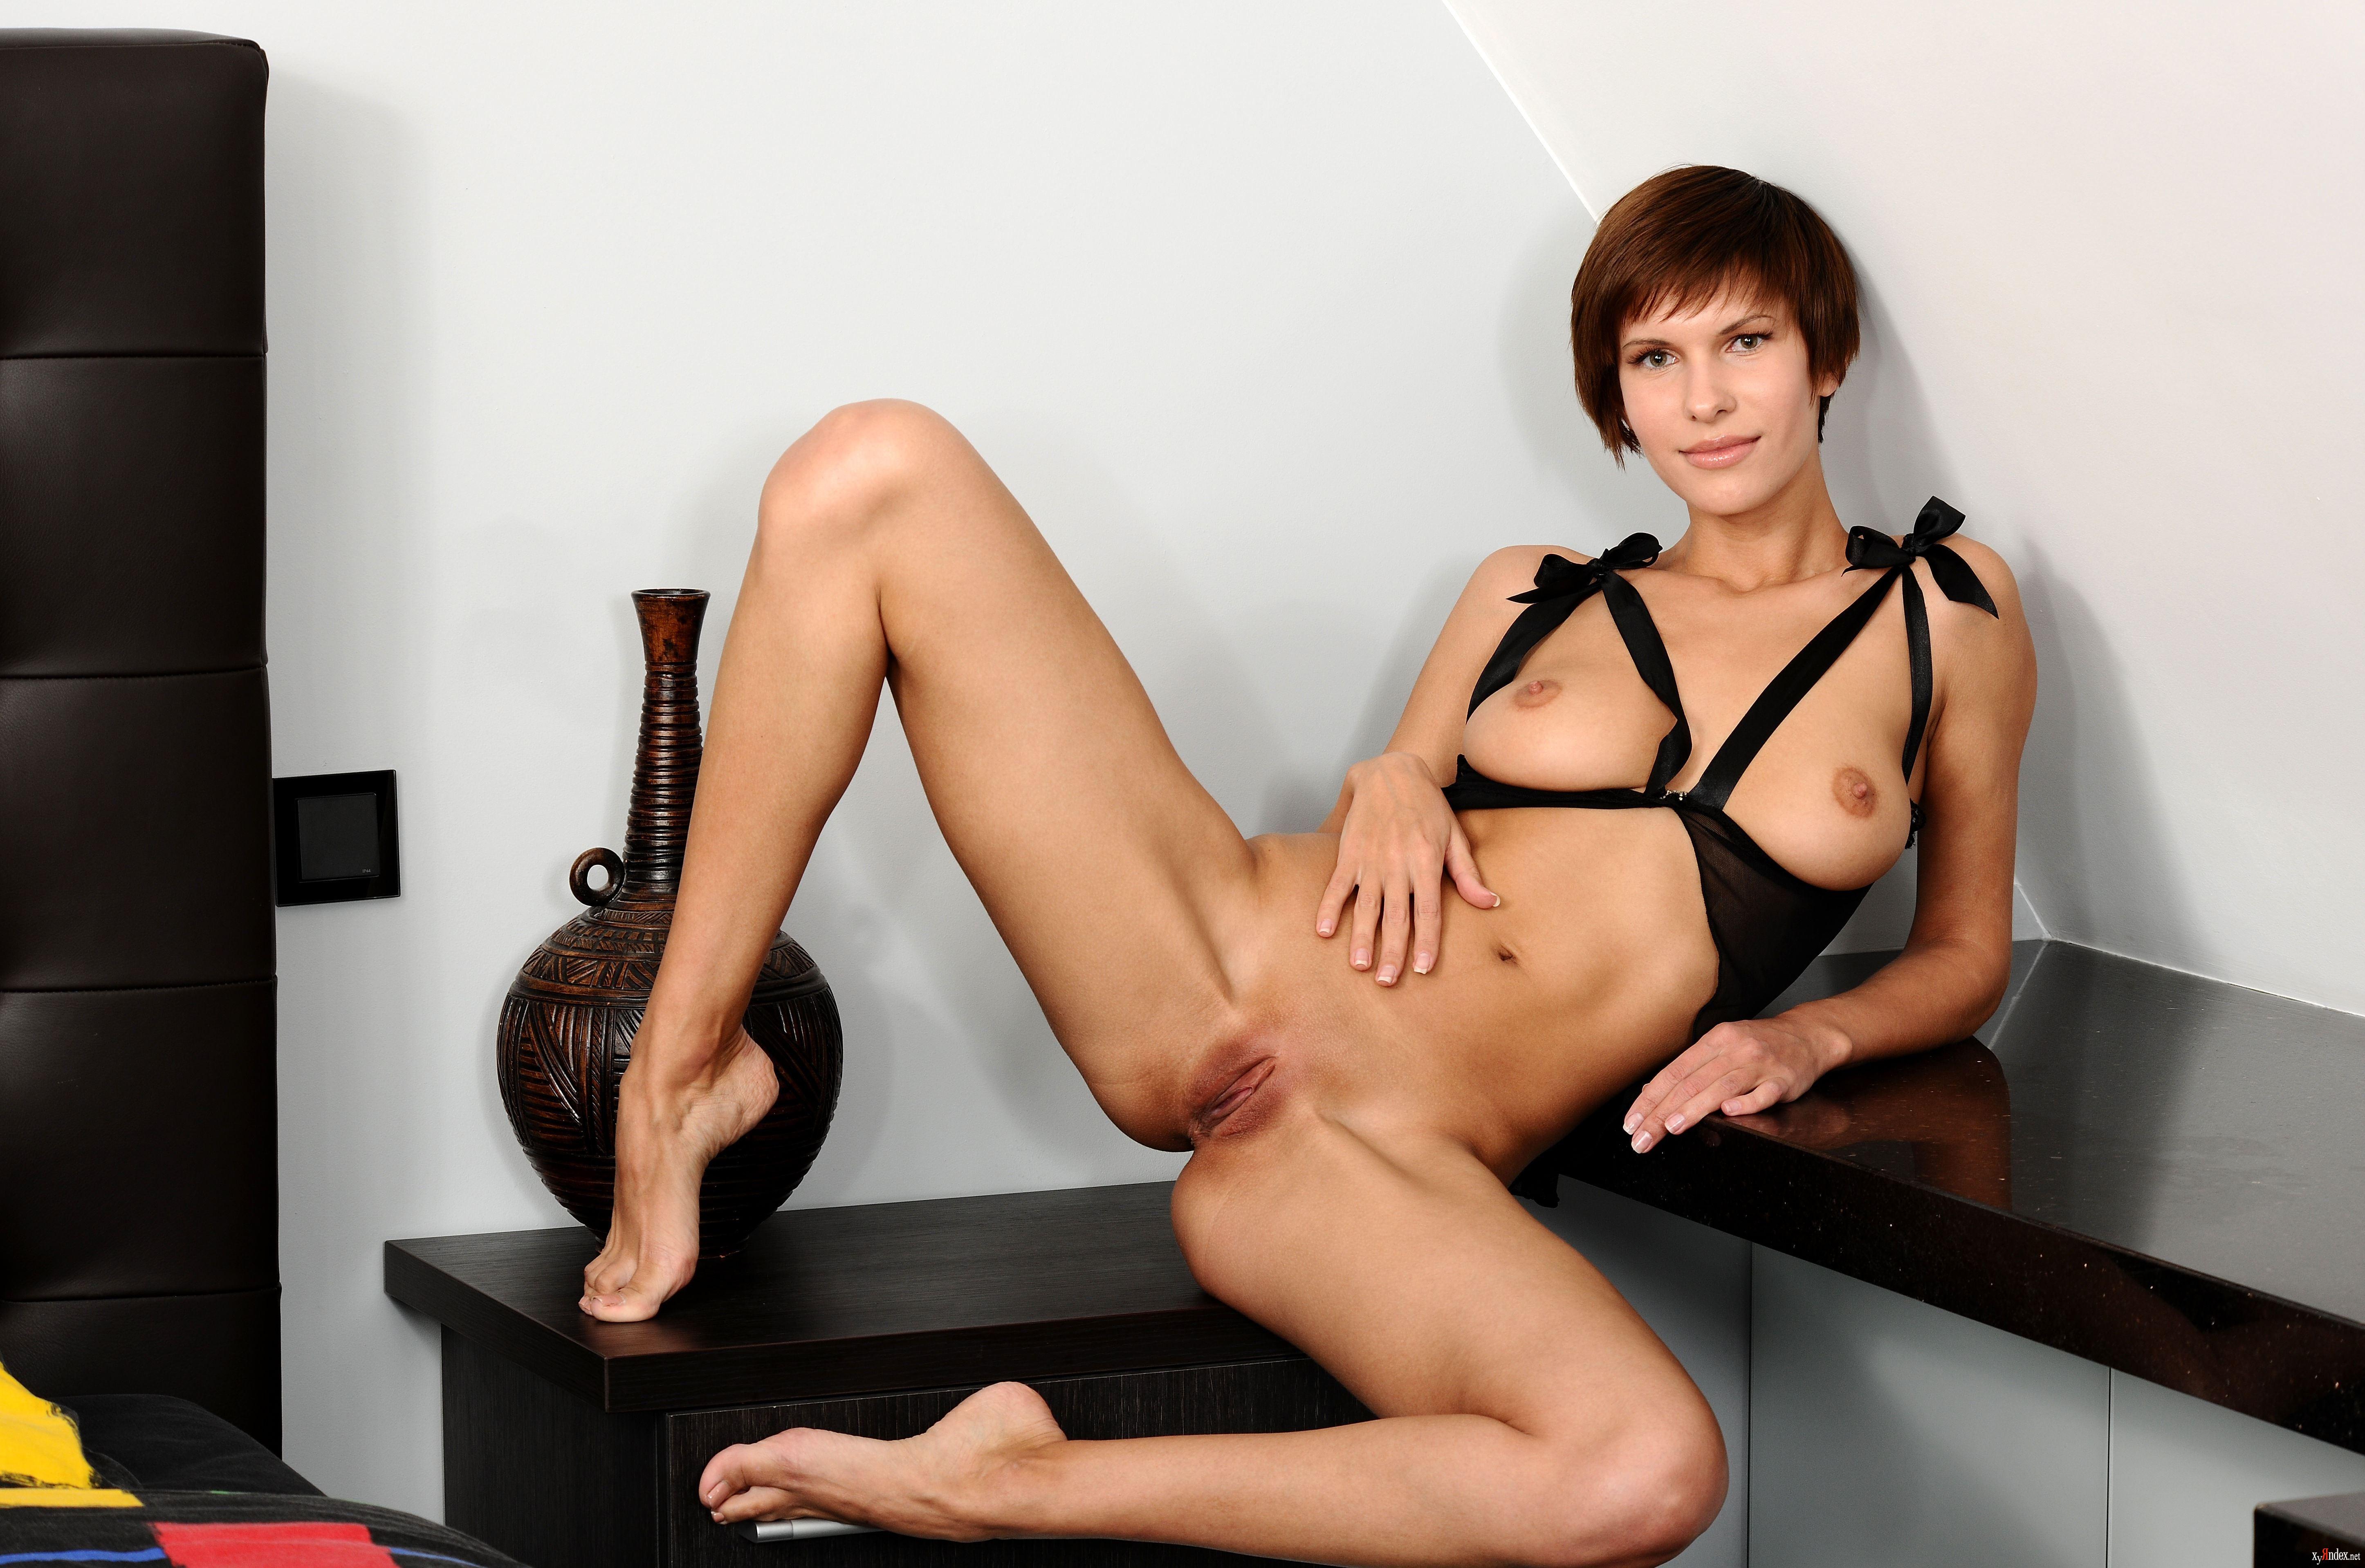 Susana spears porn pics